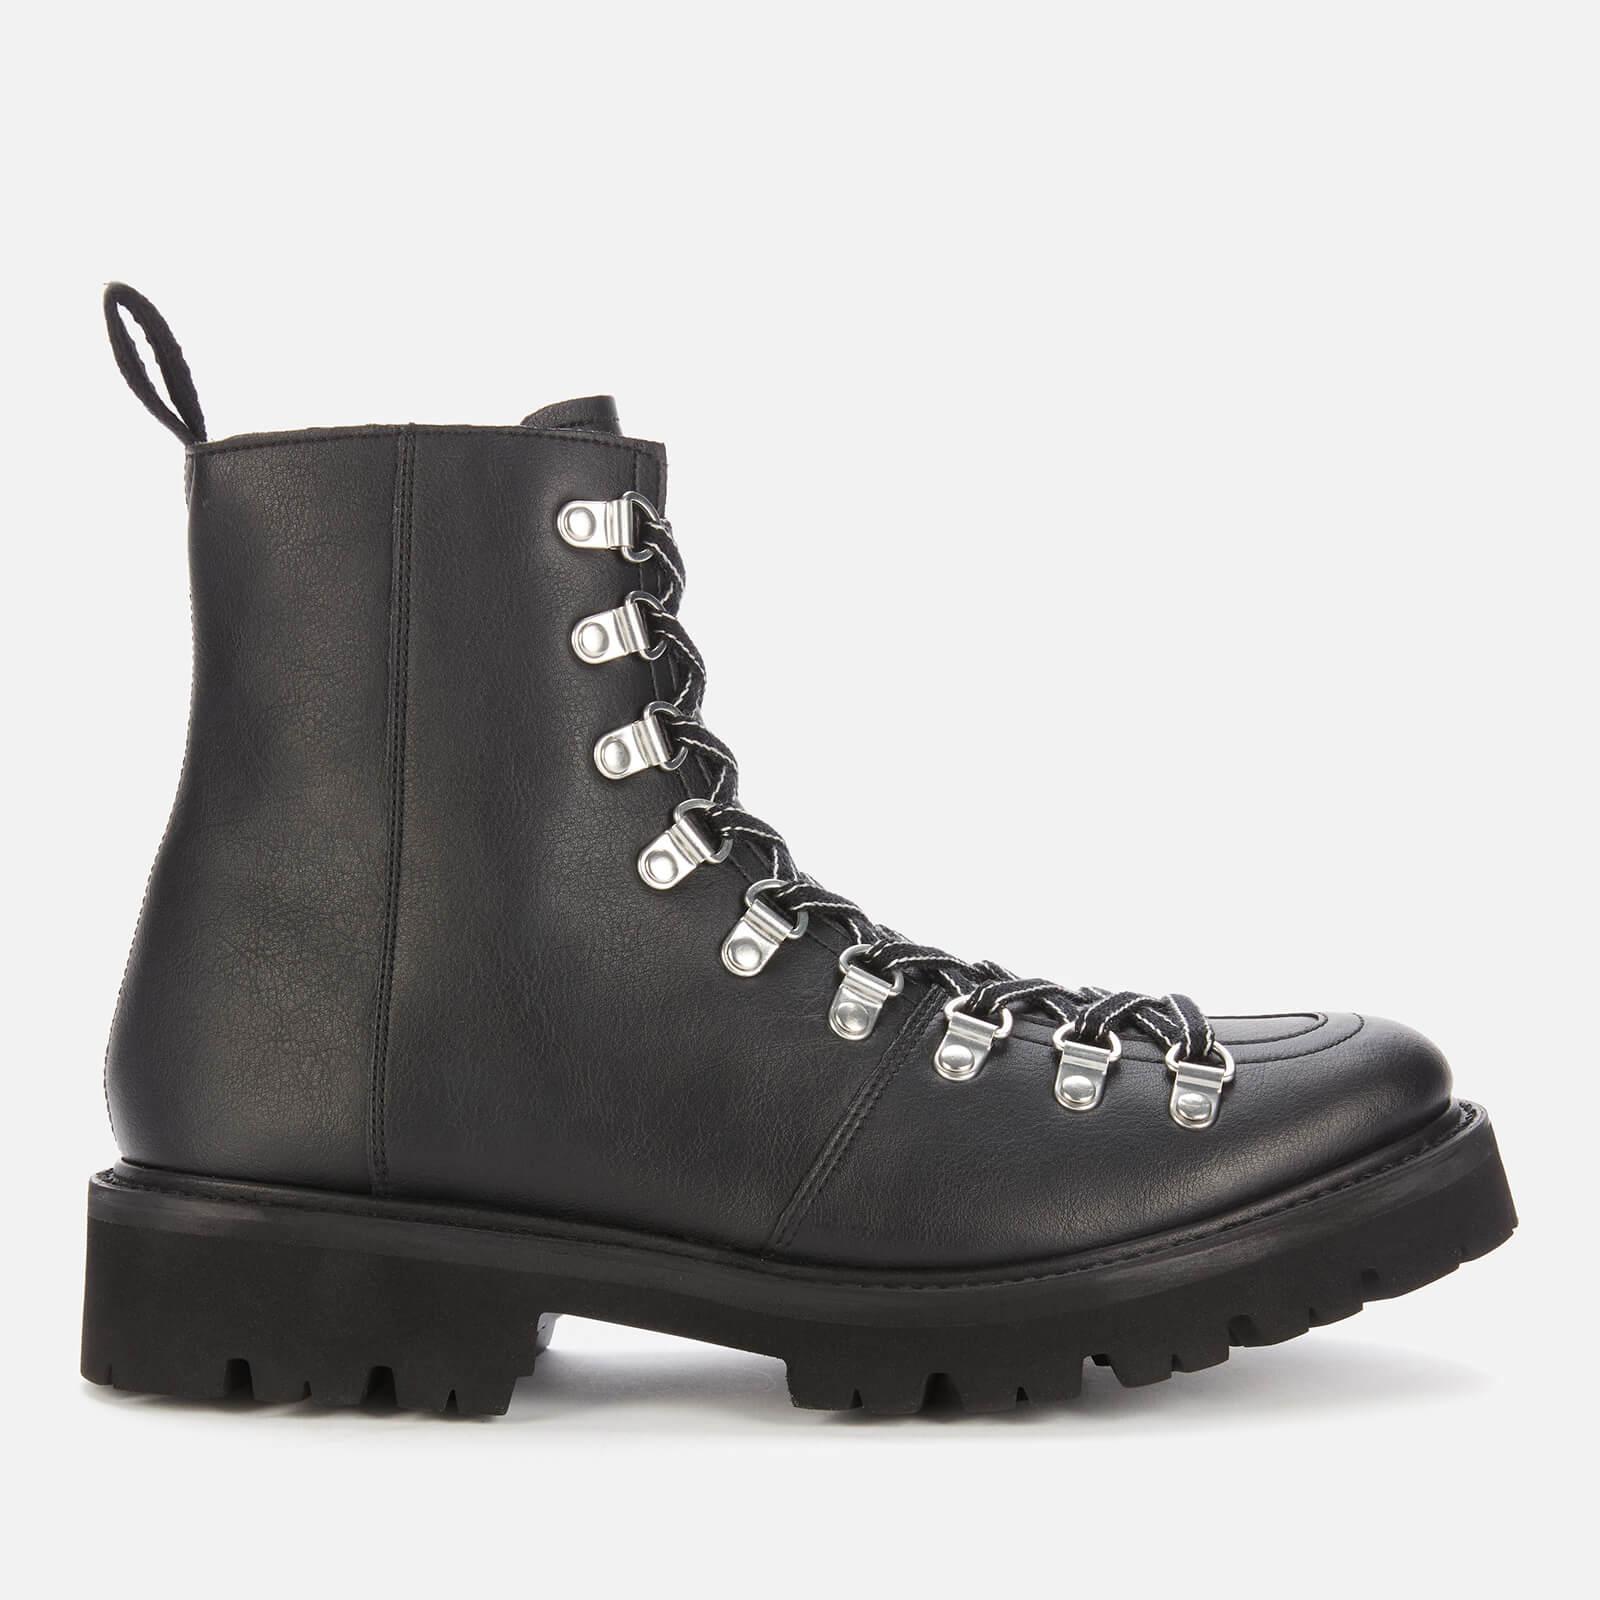 Grenson Women's Nanette Vegan Hiking Style Boots - Black - Uk  3